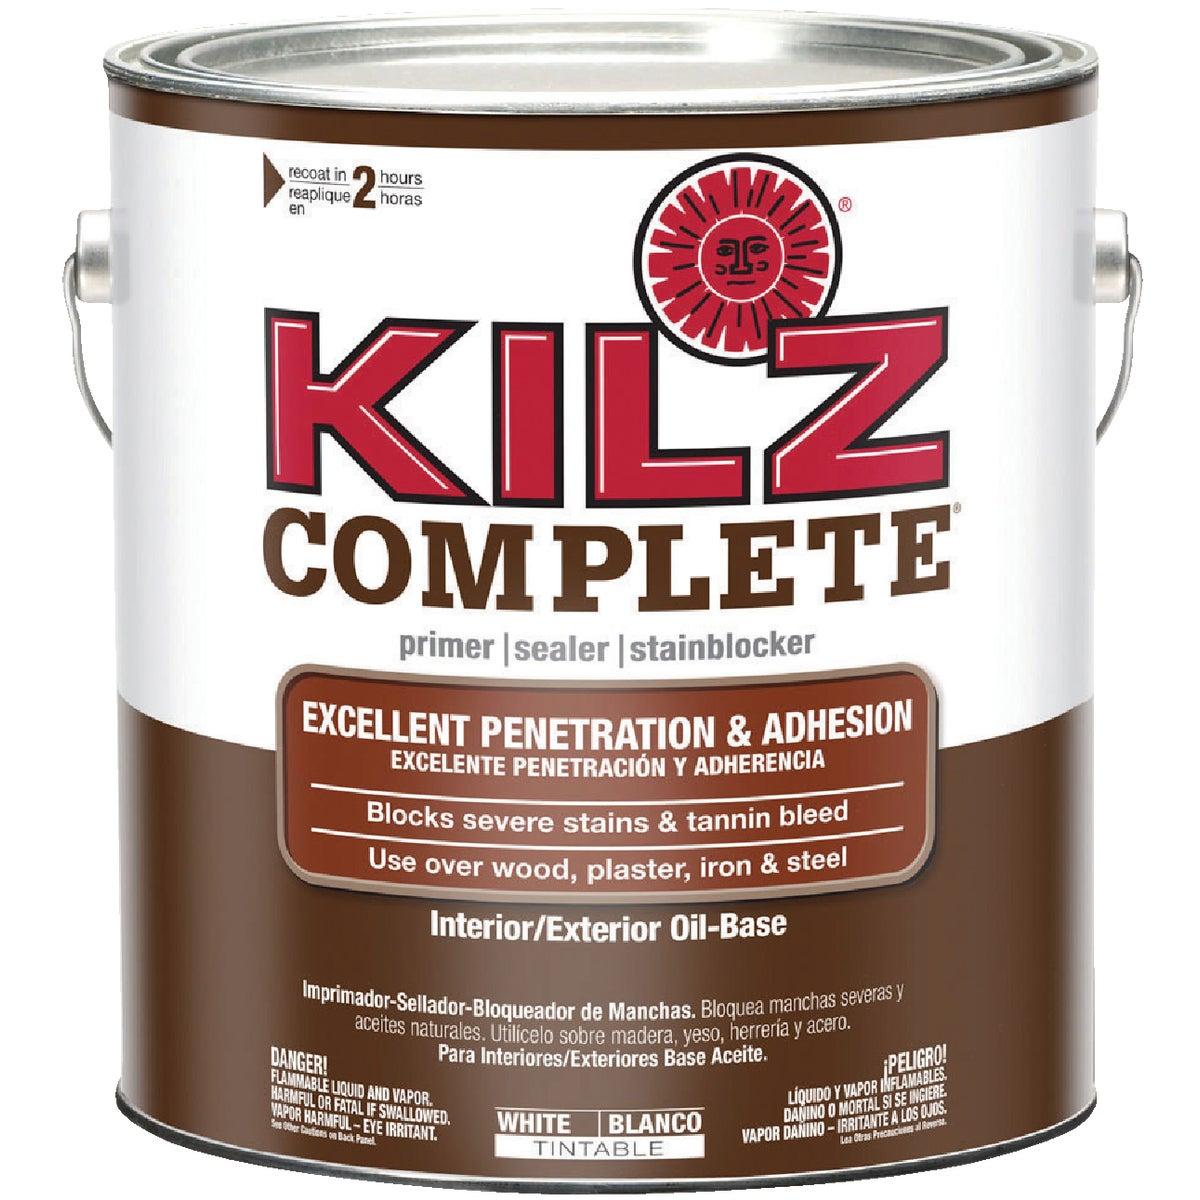 KILZ COMPLETE PRIMER